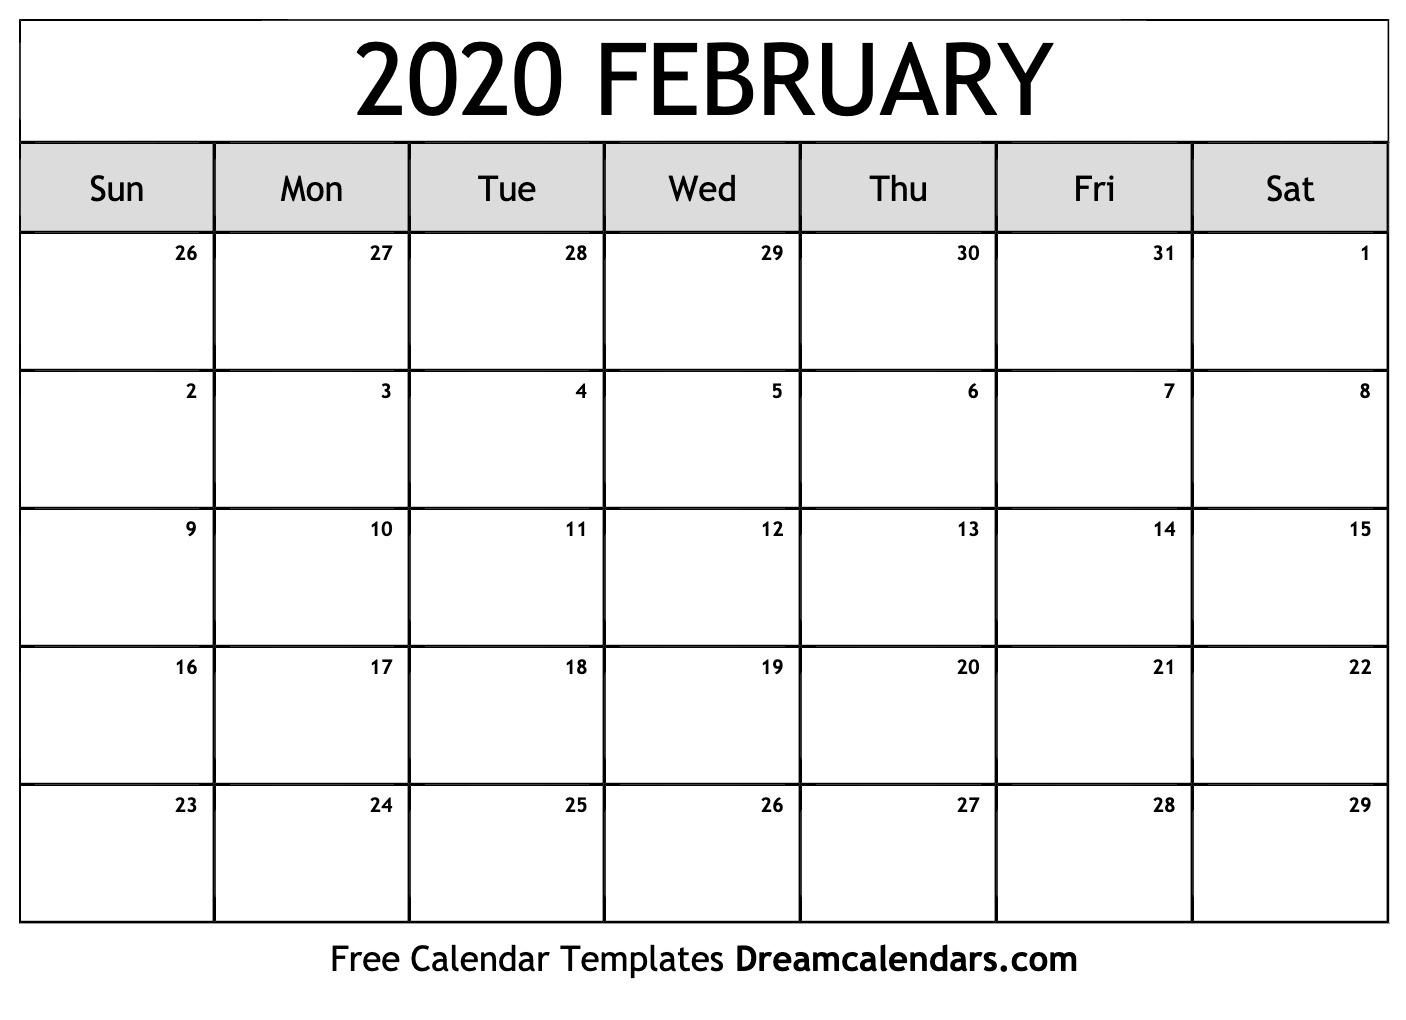 February 2020 Calendar | Free Blank Printable Templates